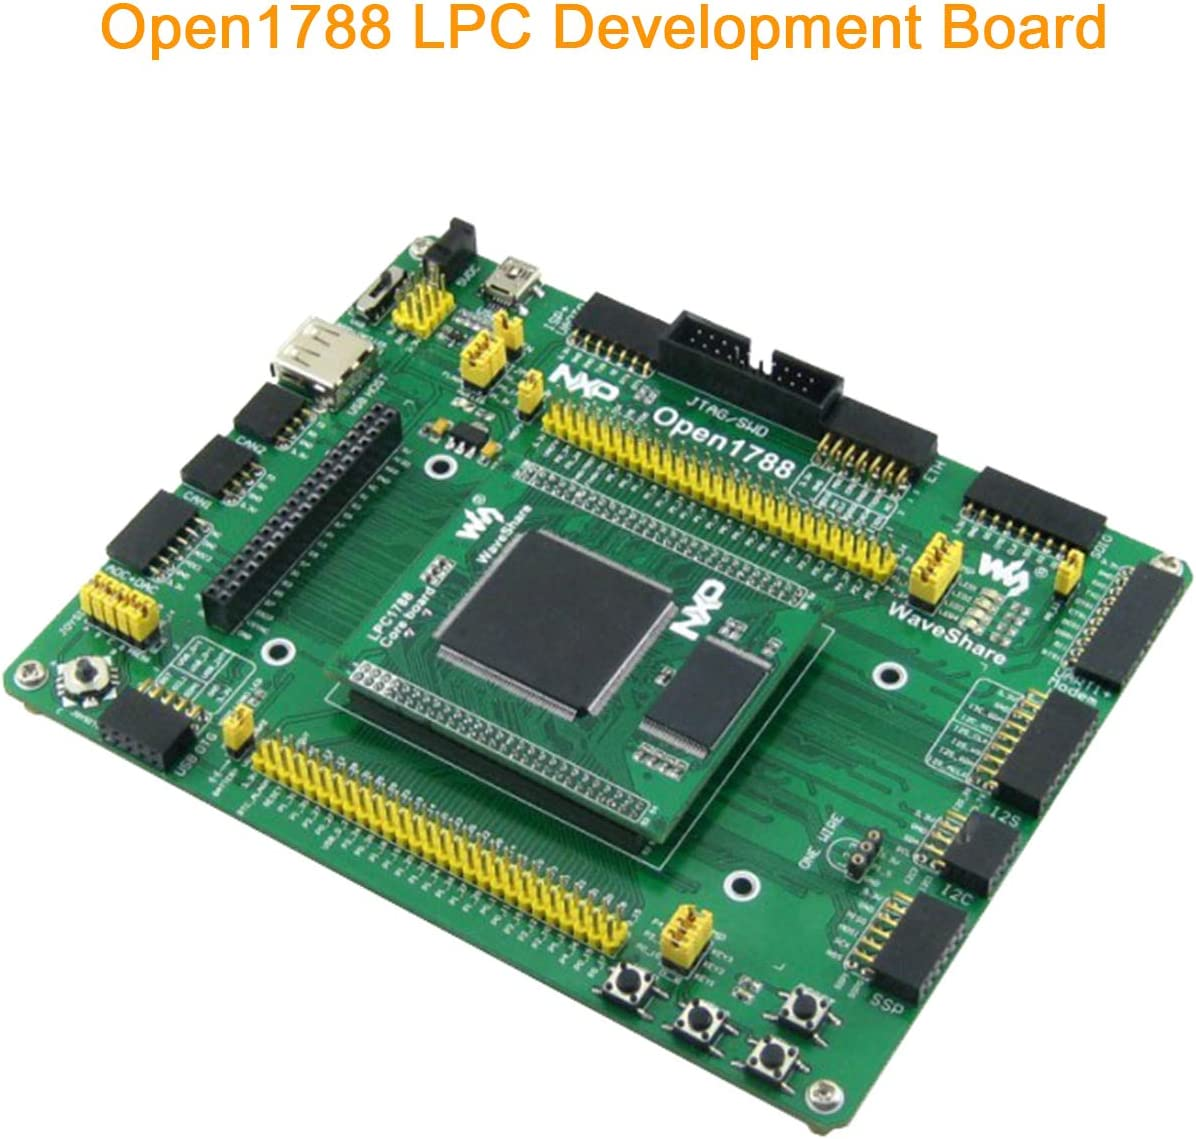 pzsmocn Open Source Electronic Module Lpc Cortex M3 with Lpc1788Fbd209 As Main Control Chip,Integrates Various Standard Interfaces Open 1788 Development Board Kit Support Various Module Access